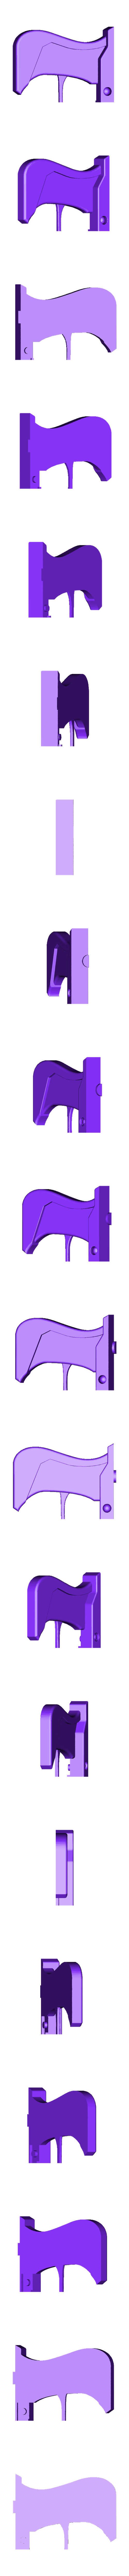 handgrip_right_1.stl Download free STL file 9 gague plasma pistol with barrel tip cover (MPMS mini) • 3D print template, PM_ME_YOUR_VALUE